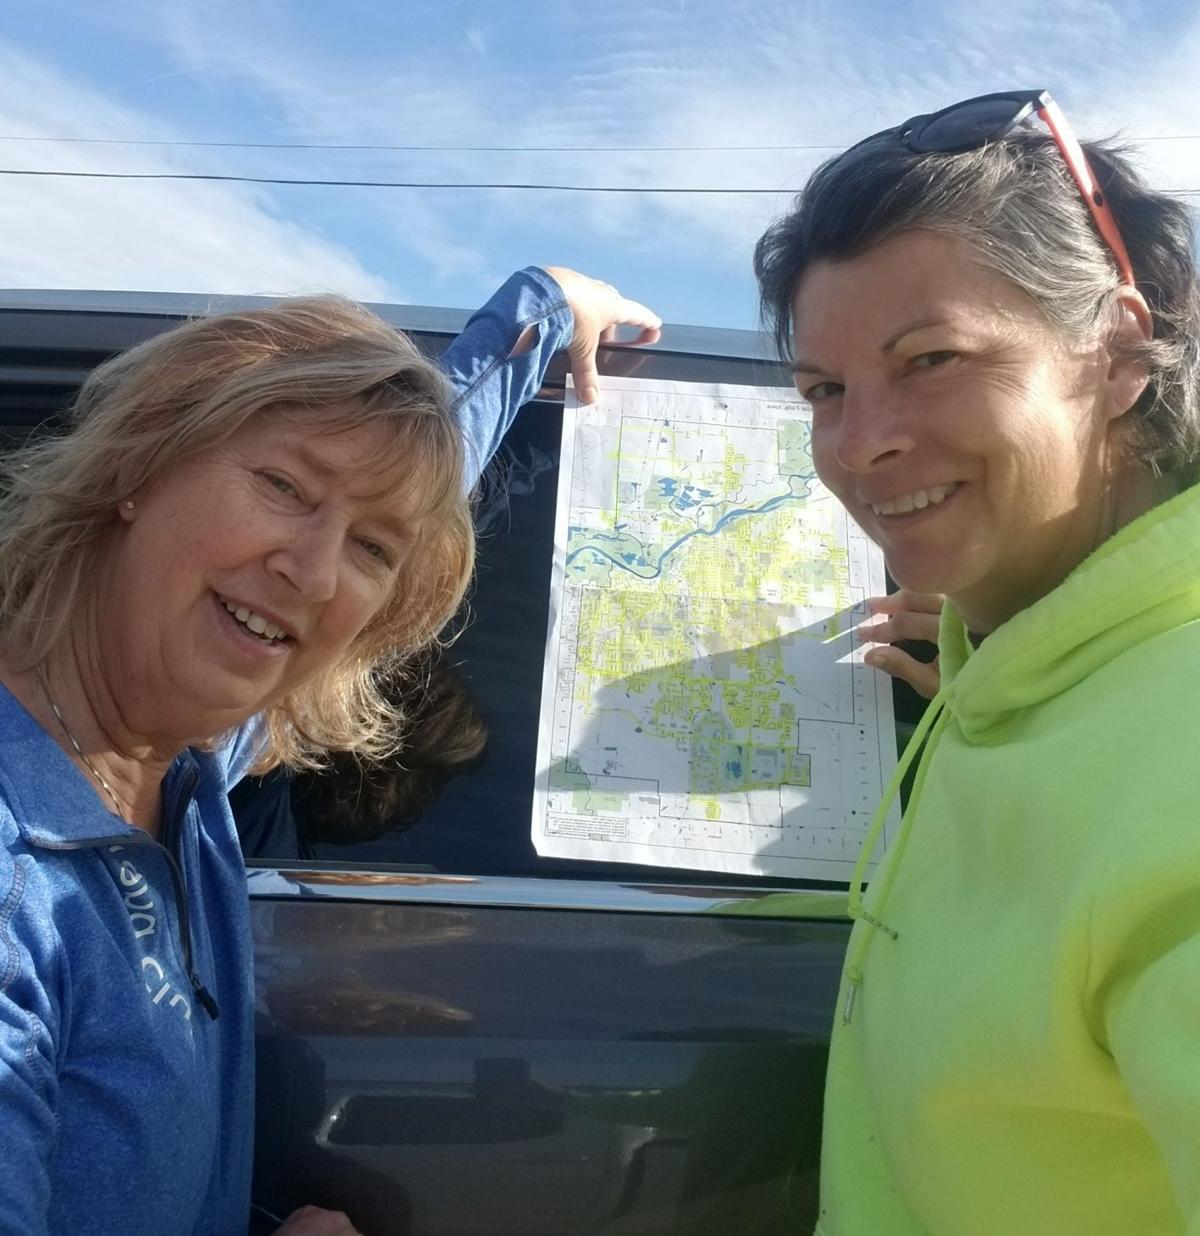 Bonnie Wetzel and Sara Jansen of Cedar Falls